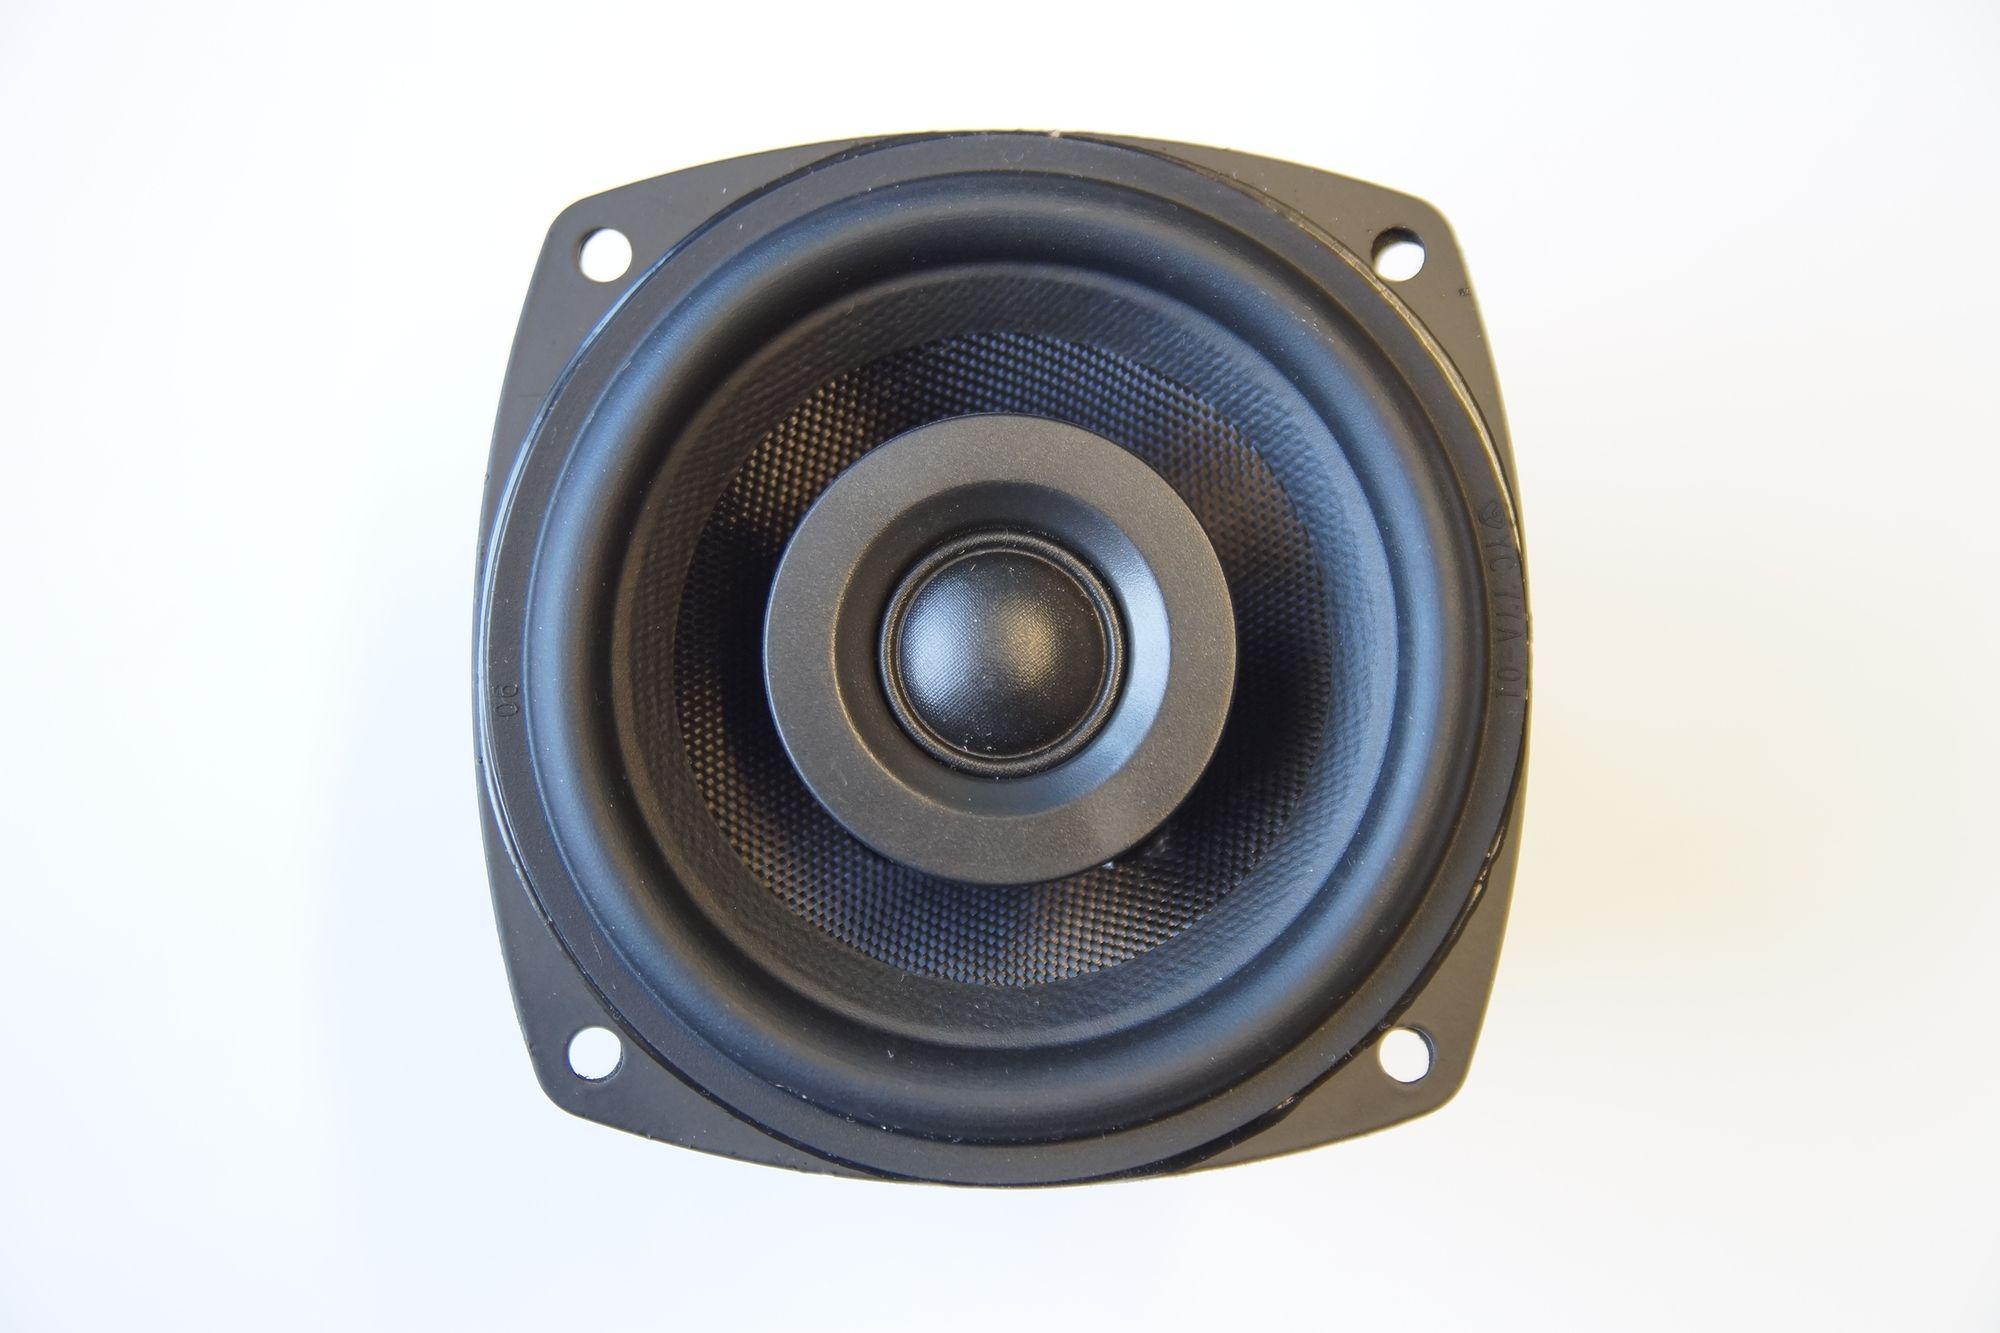 1 Stück Coax Lautsprecher Magnat MCO 90 S-GF 870 D / Art.Nr.: 349512 Serviceware 001